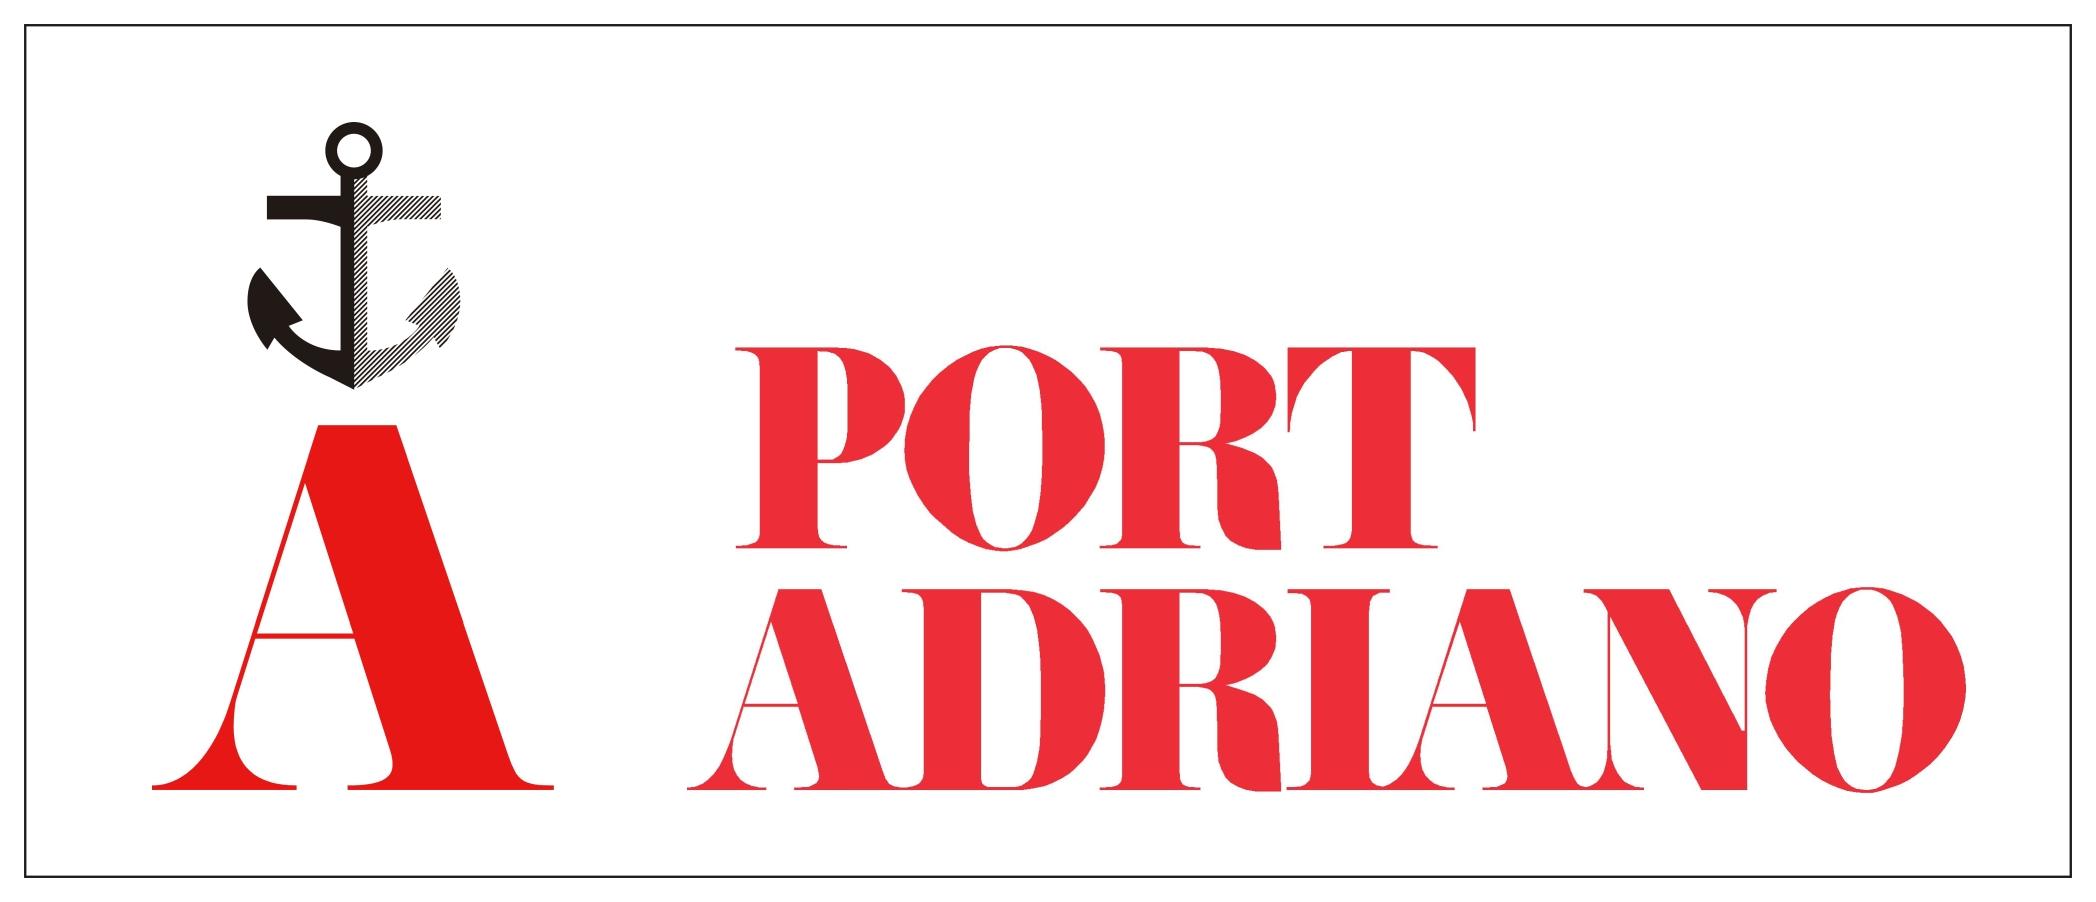 LONA PORT ADRIANO